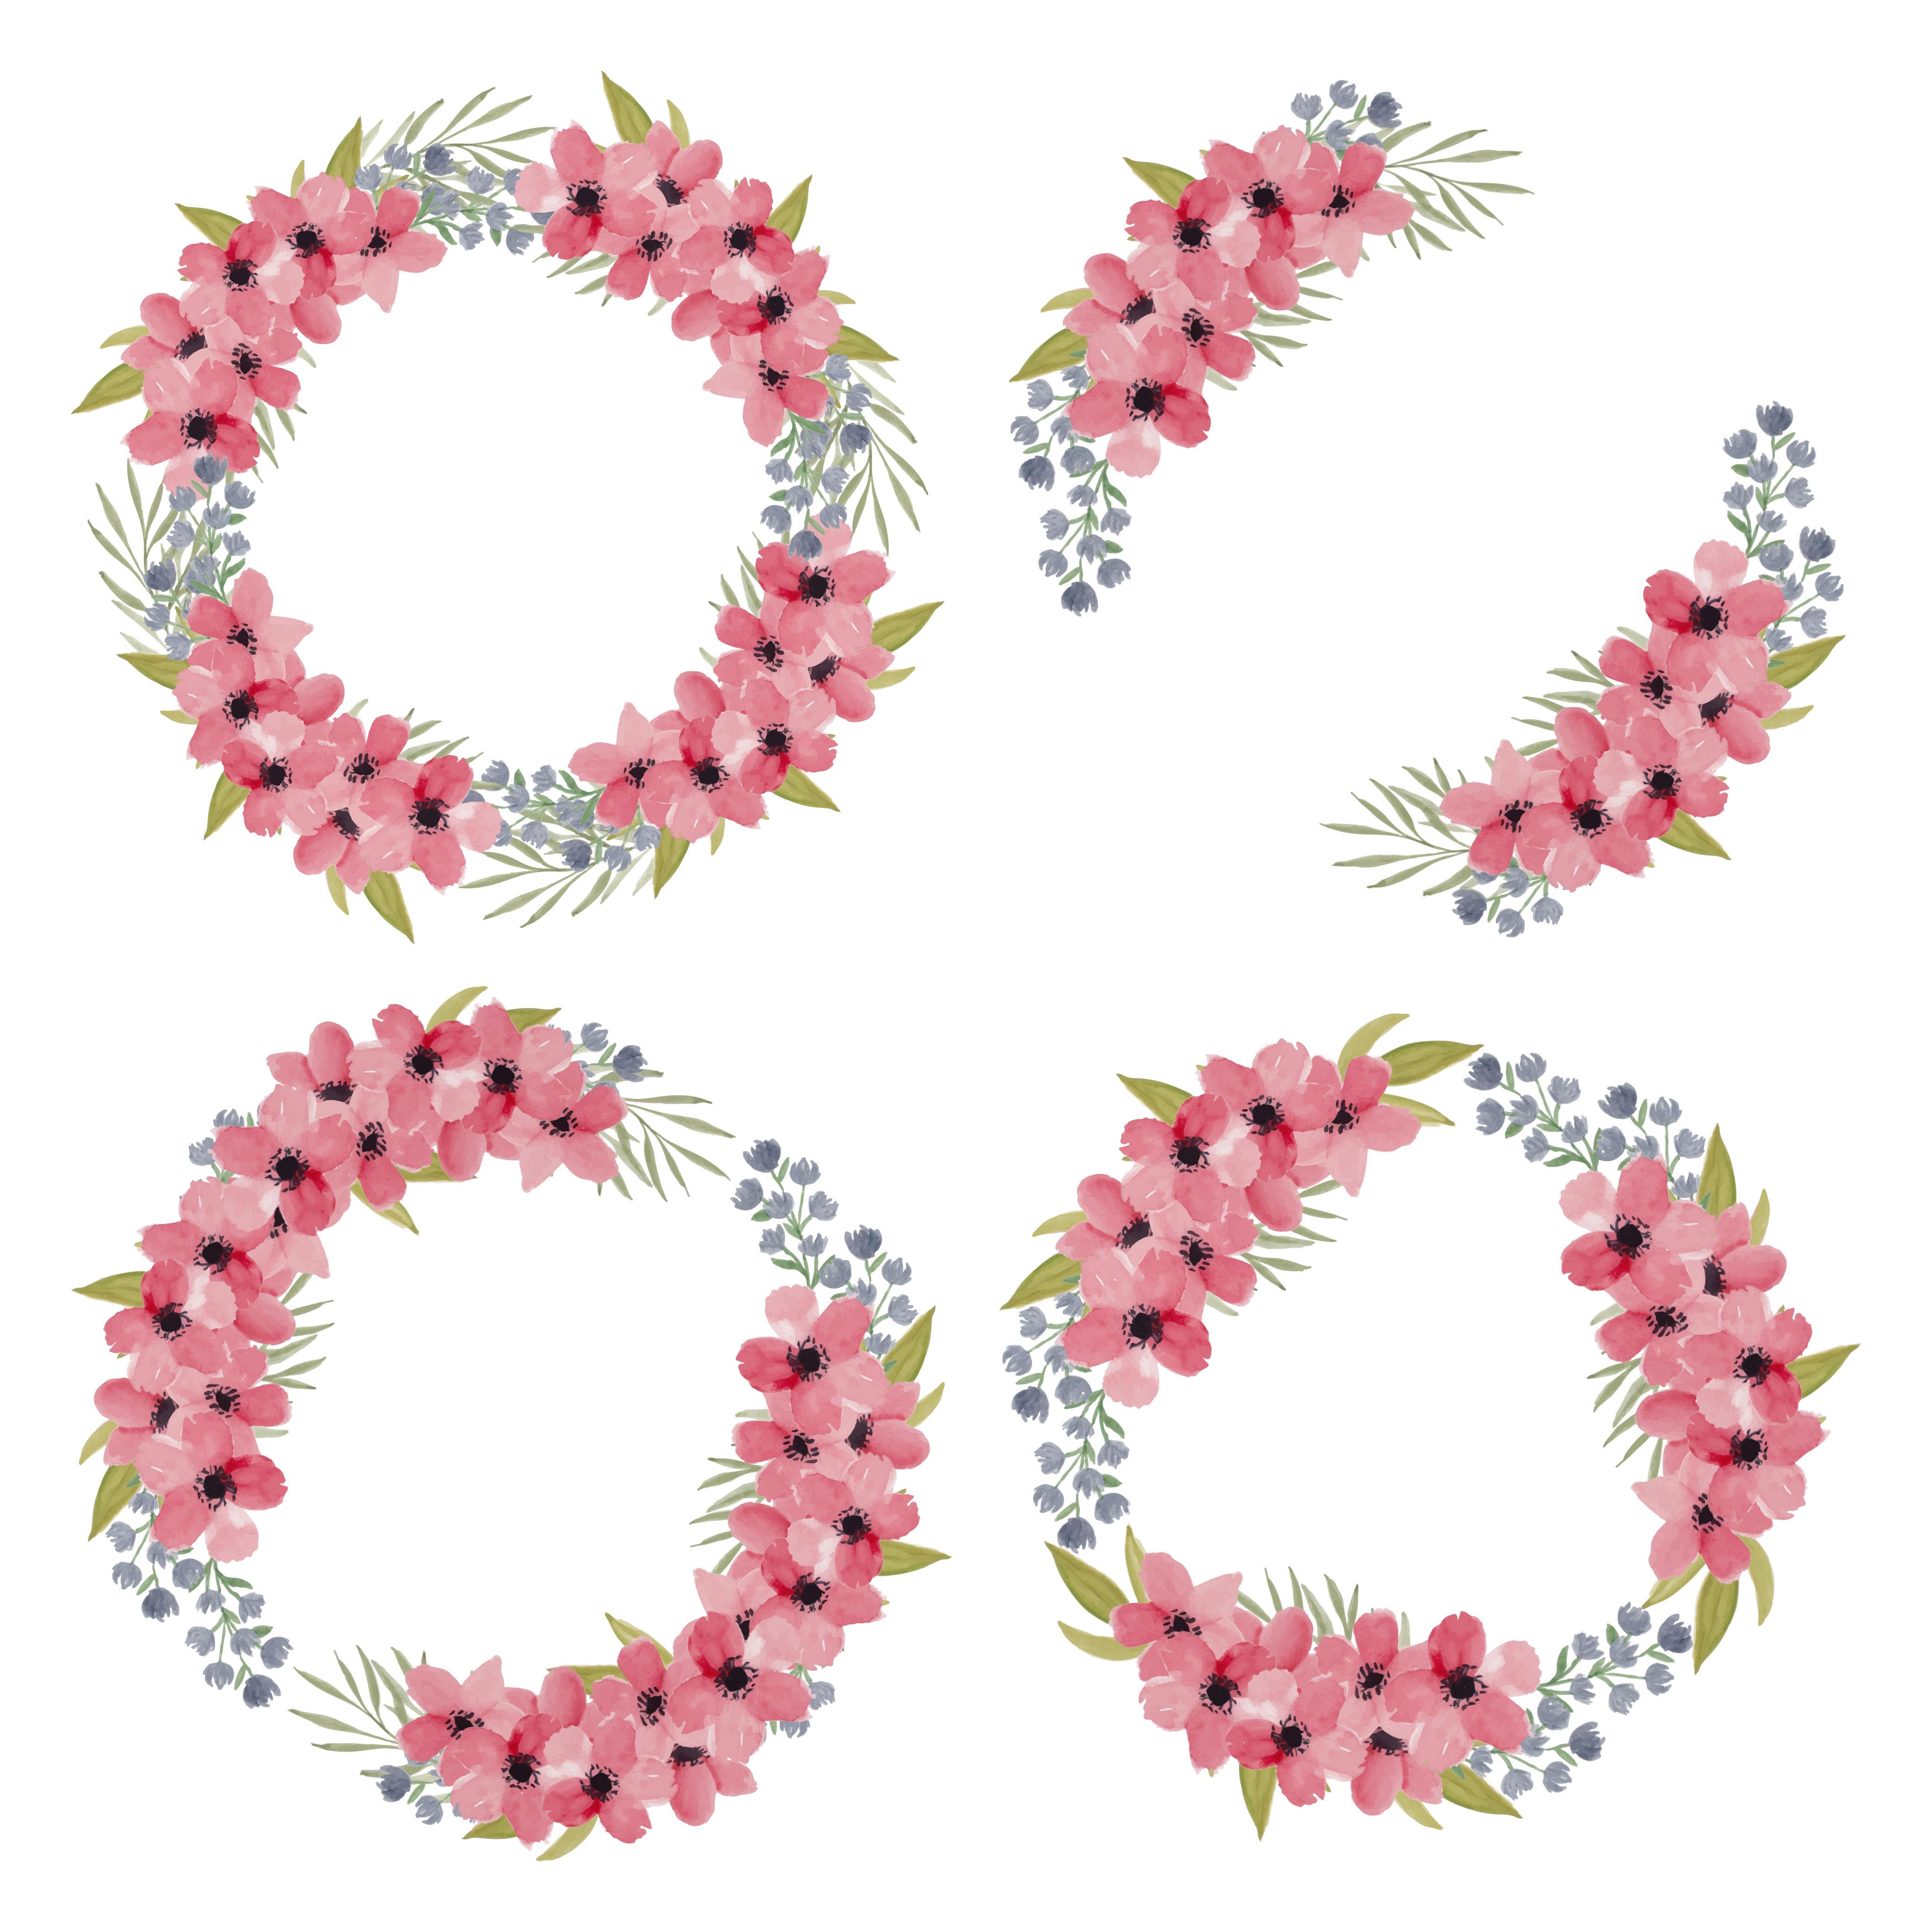 Watercolor Pink Petal Cherry Blossom Flower Wreath